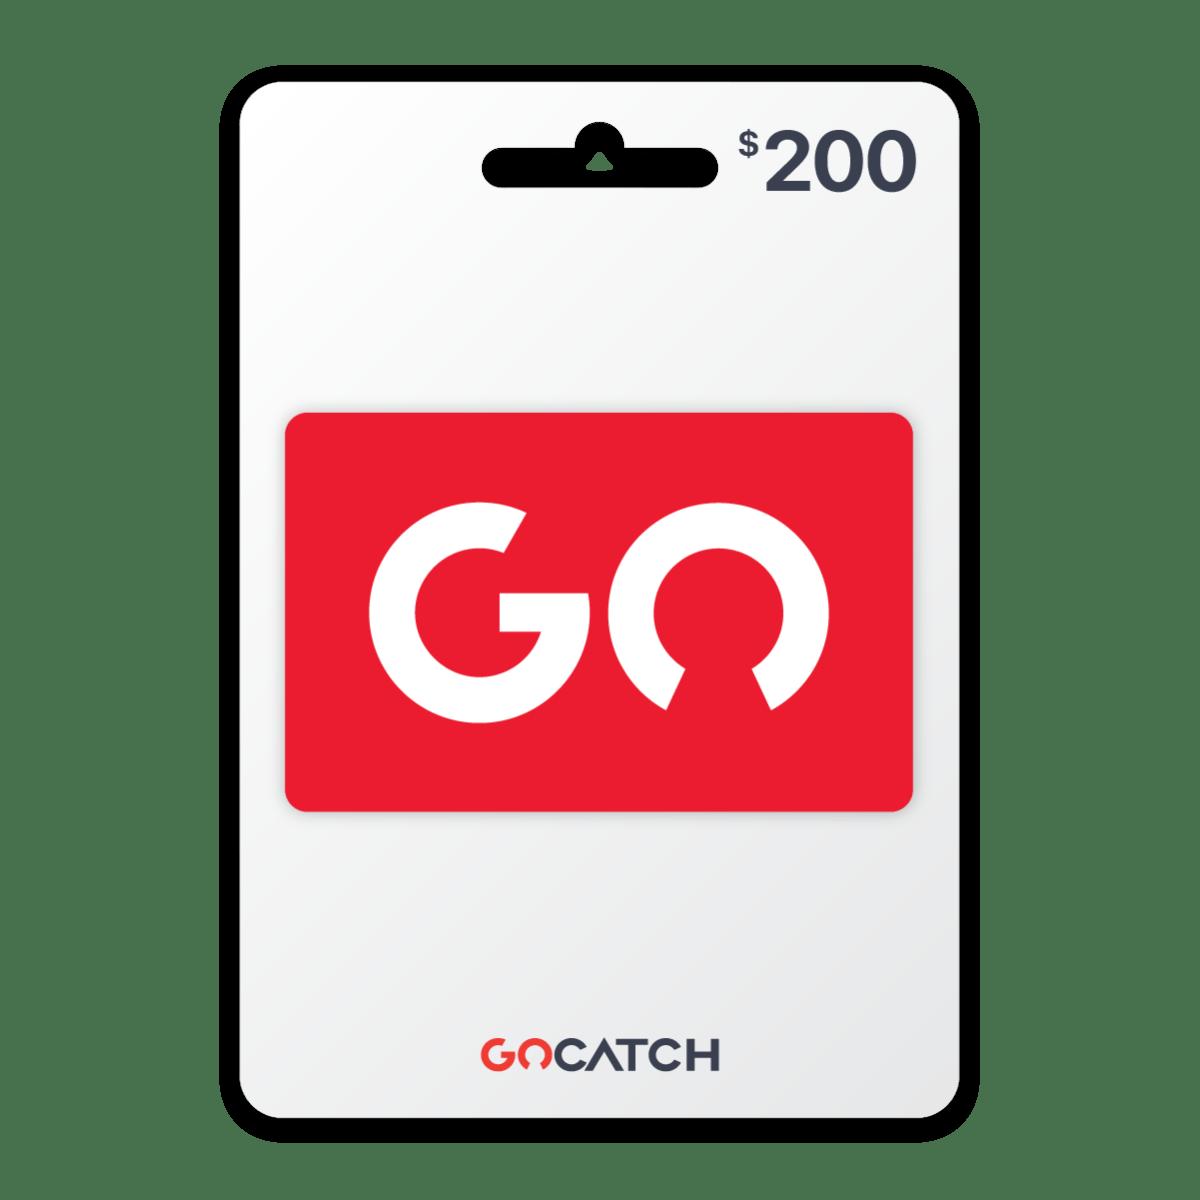 $200 Gift Card 3